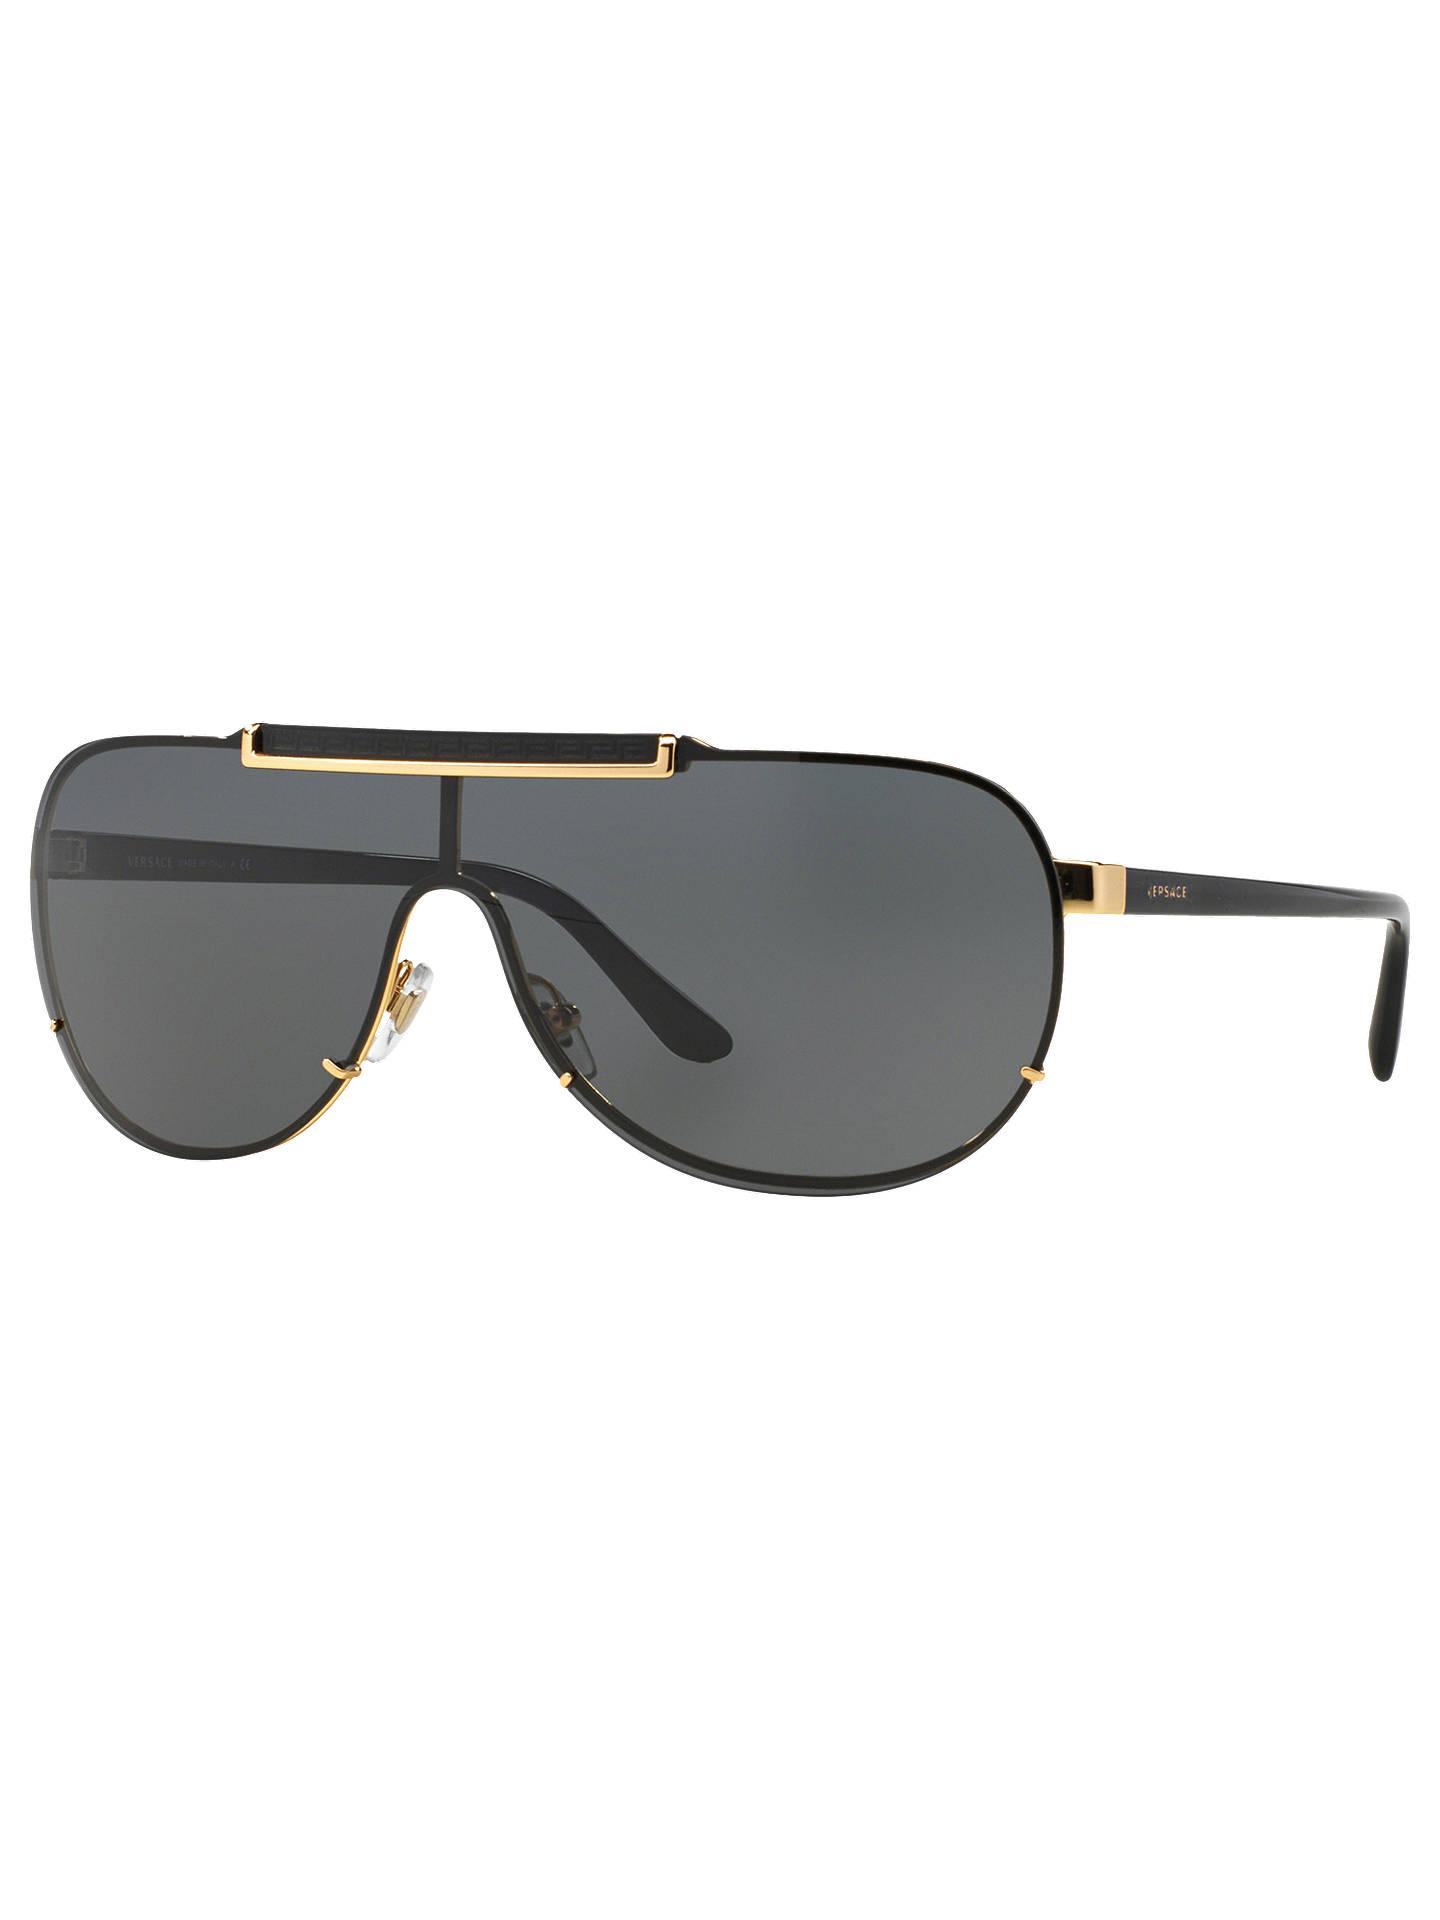 ce558c9788 Buy Versace VE2140 Aviator Sunglasses